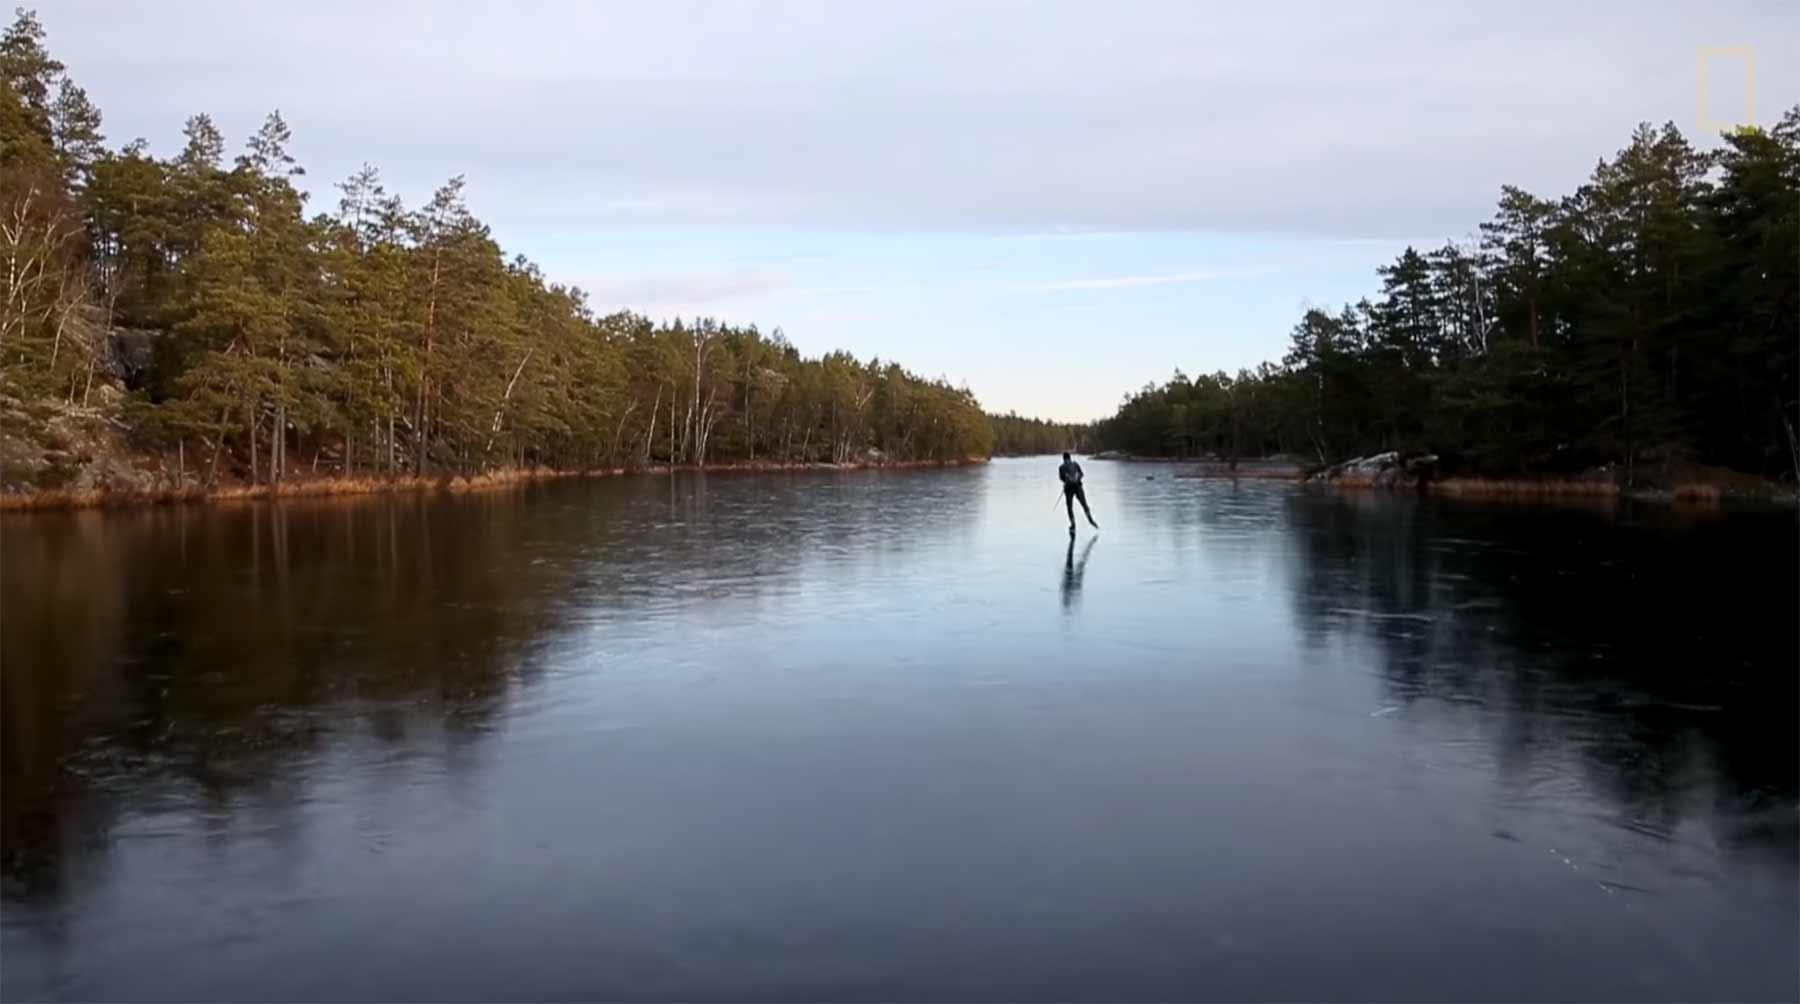 Auf ganz dünnem Eis fahren klingt wunderschön